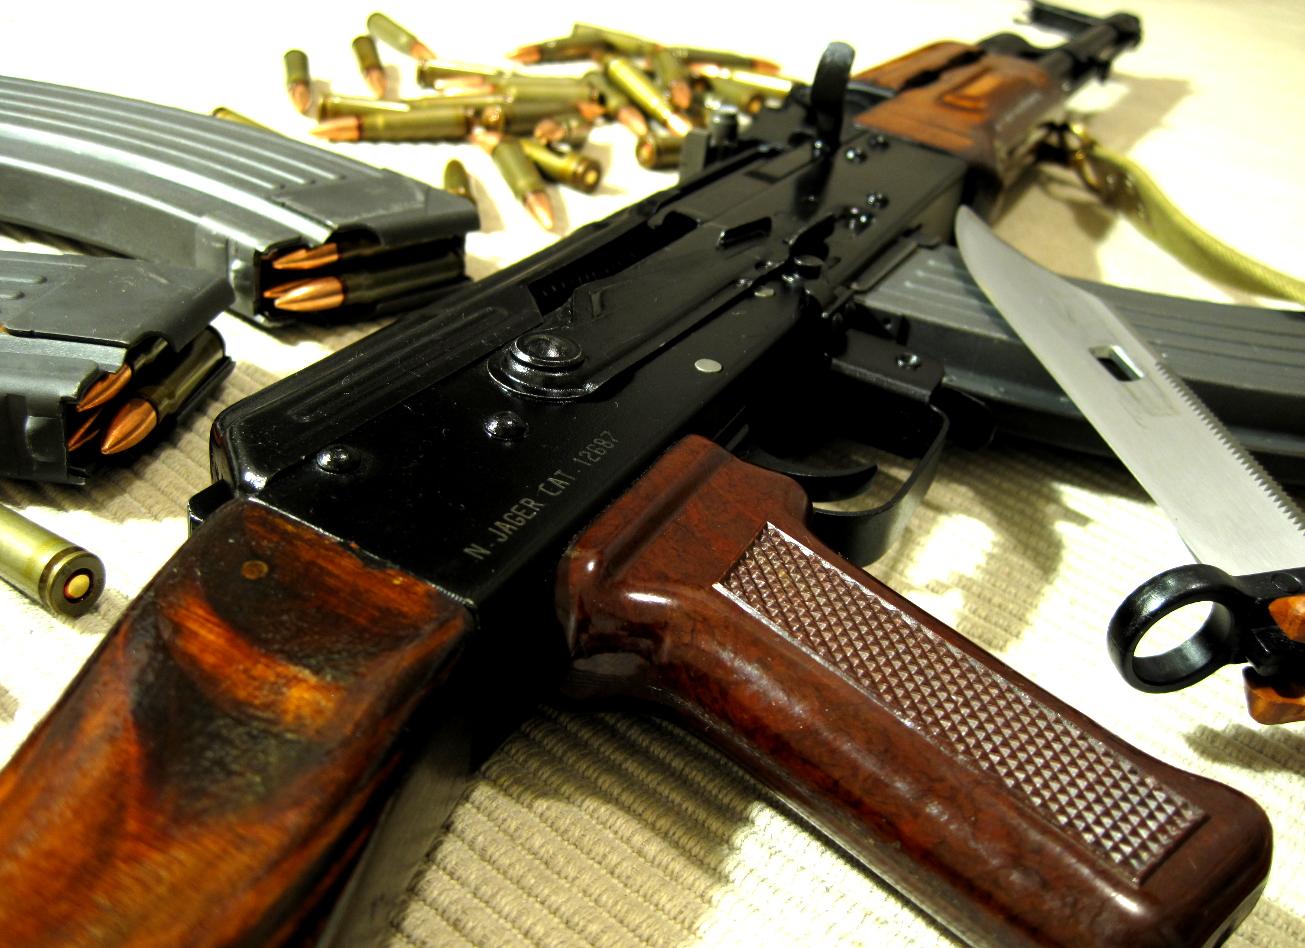 shooting à prague glock Uzi et AK-47 prague activites vimigo